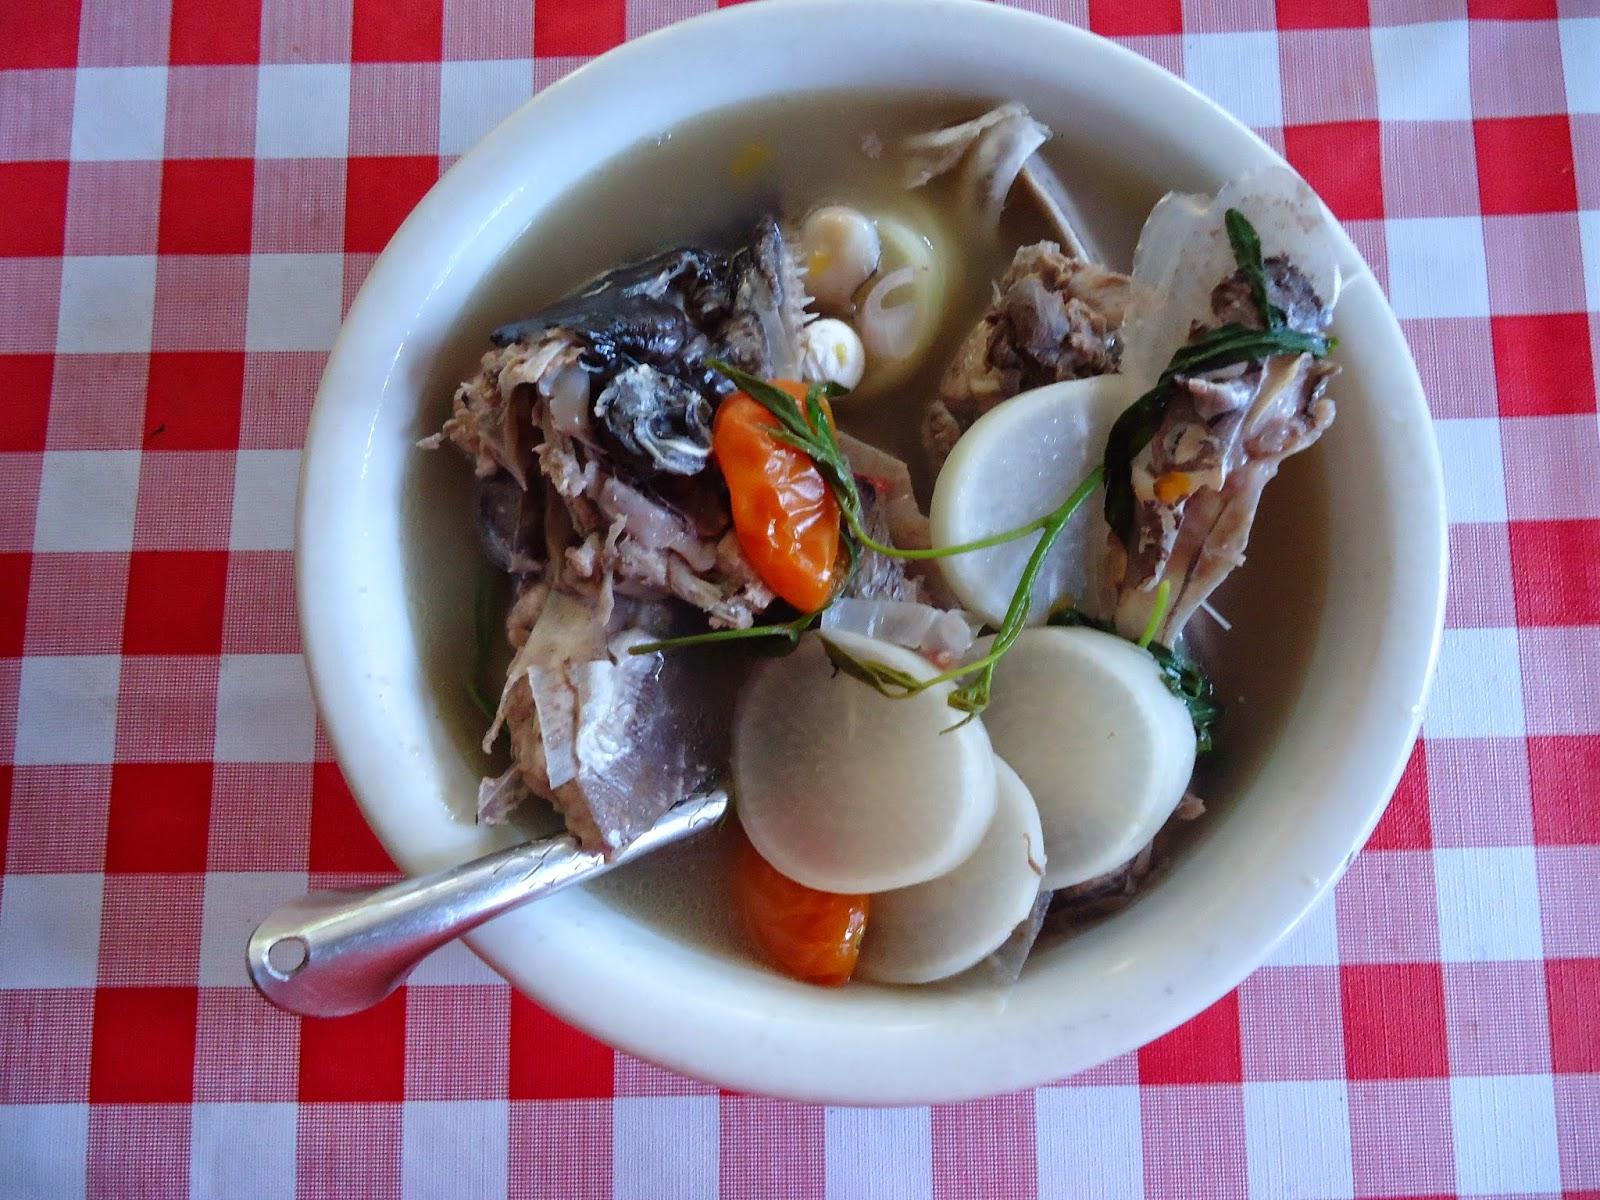 fish sinigang of Filipino sour fish stew